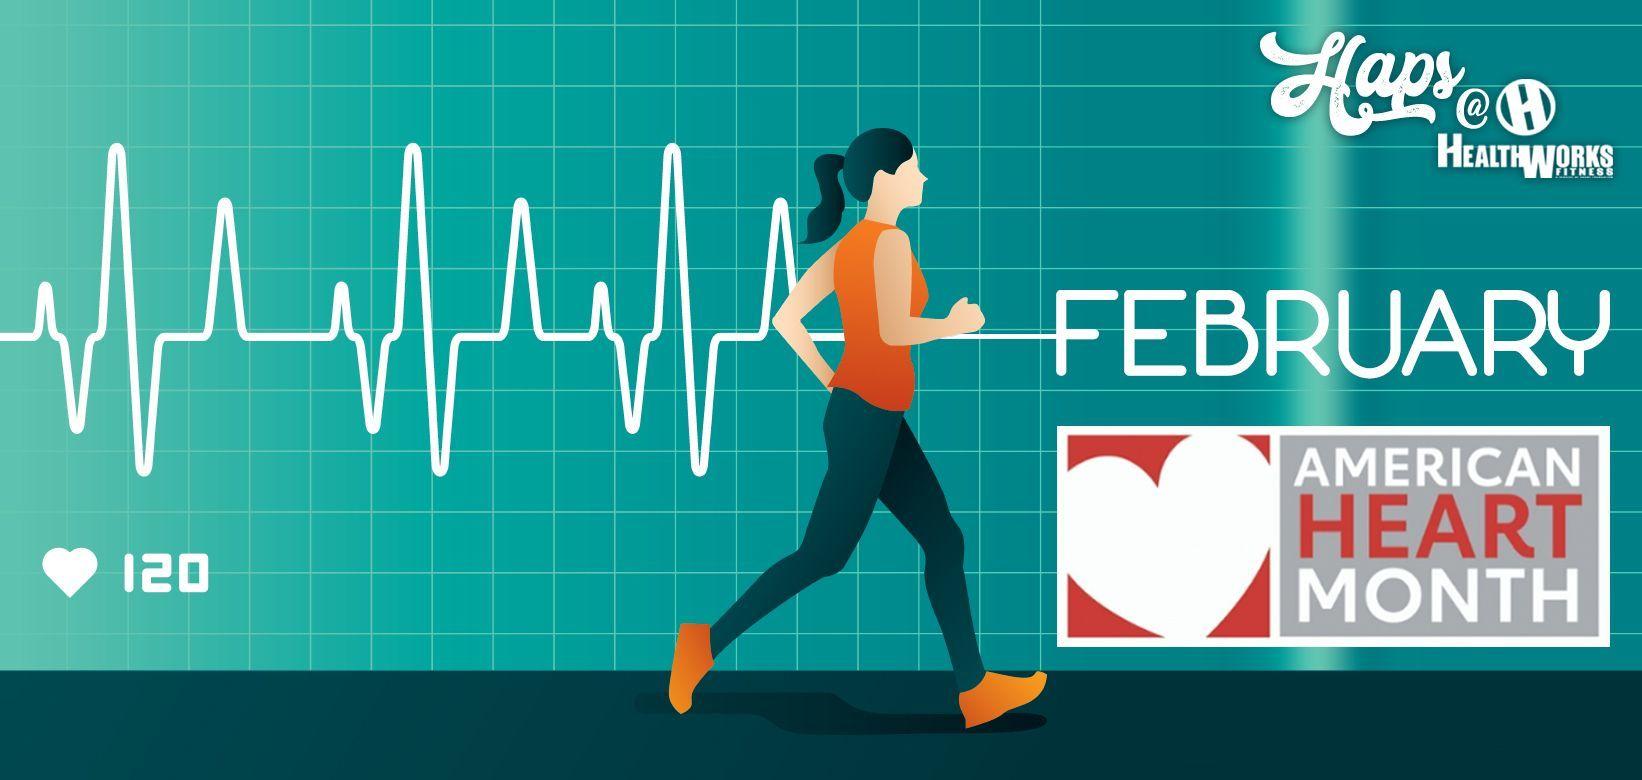 Haps @ HealthWorks February 2021